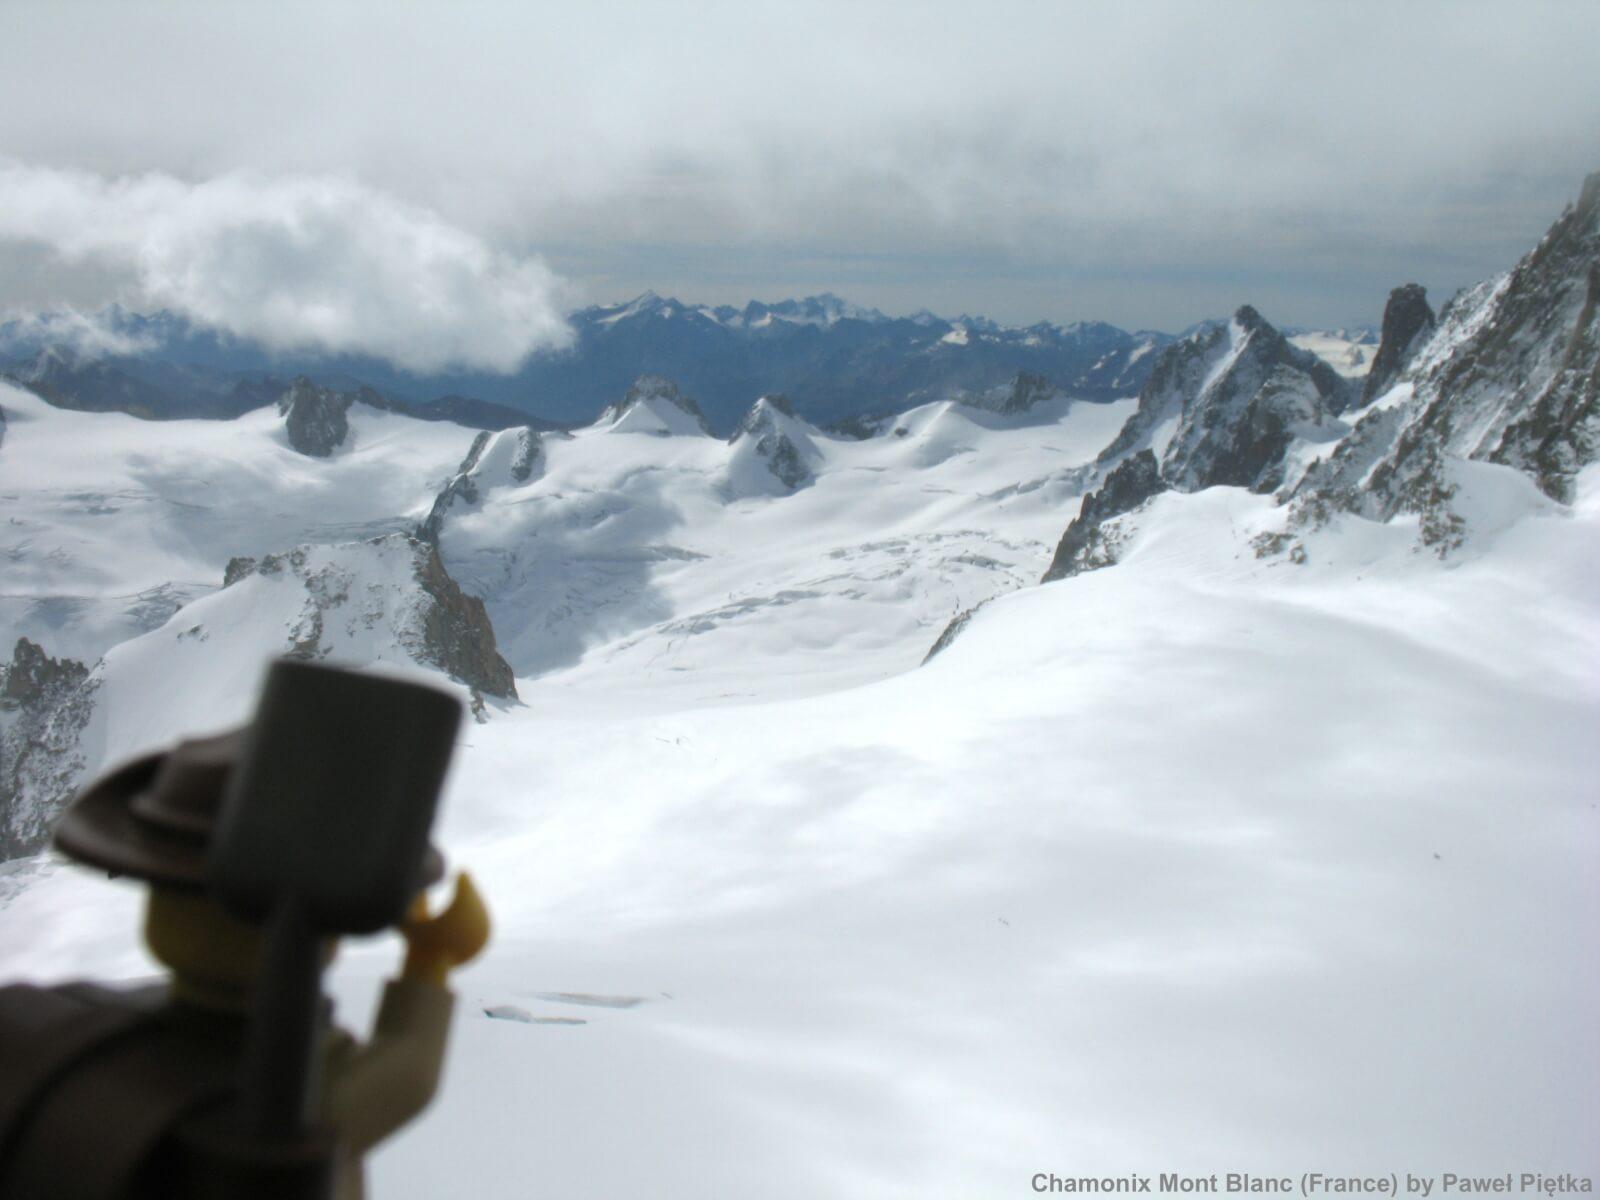 Chamonix Mont Blanc (France) 4